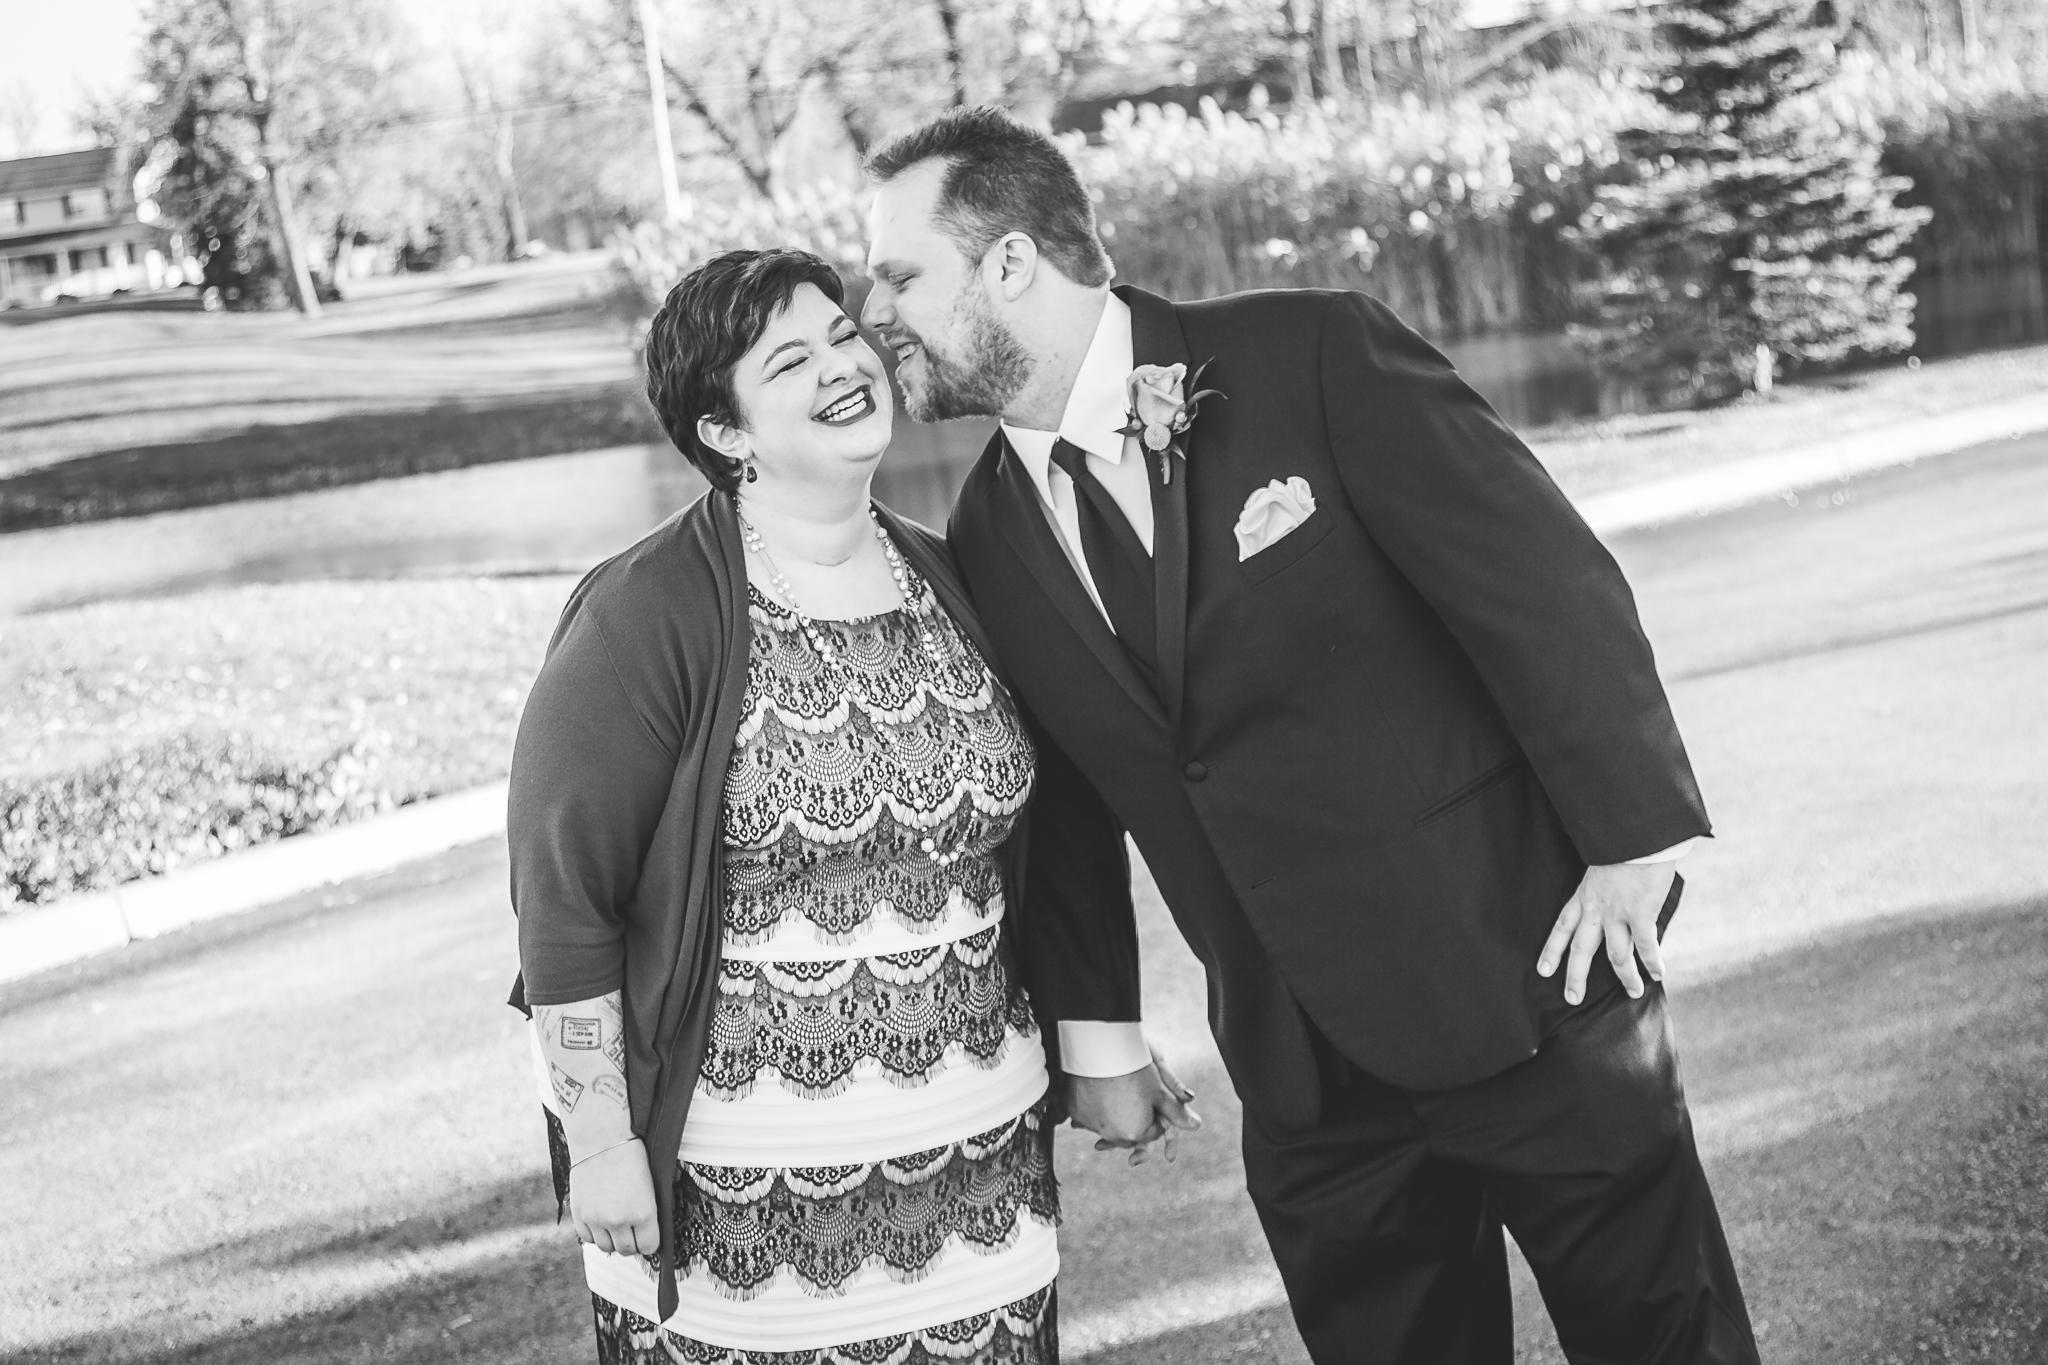 camuglia-whomstudio-chelsea_and_andy-nycphotographer-wedding-brooklyn-buffalo-timberlodge-029-5326.jpg